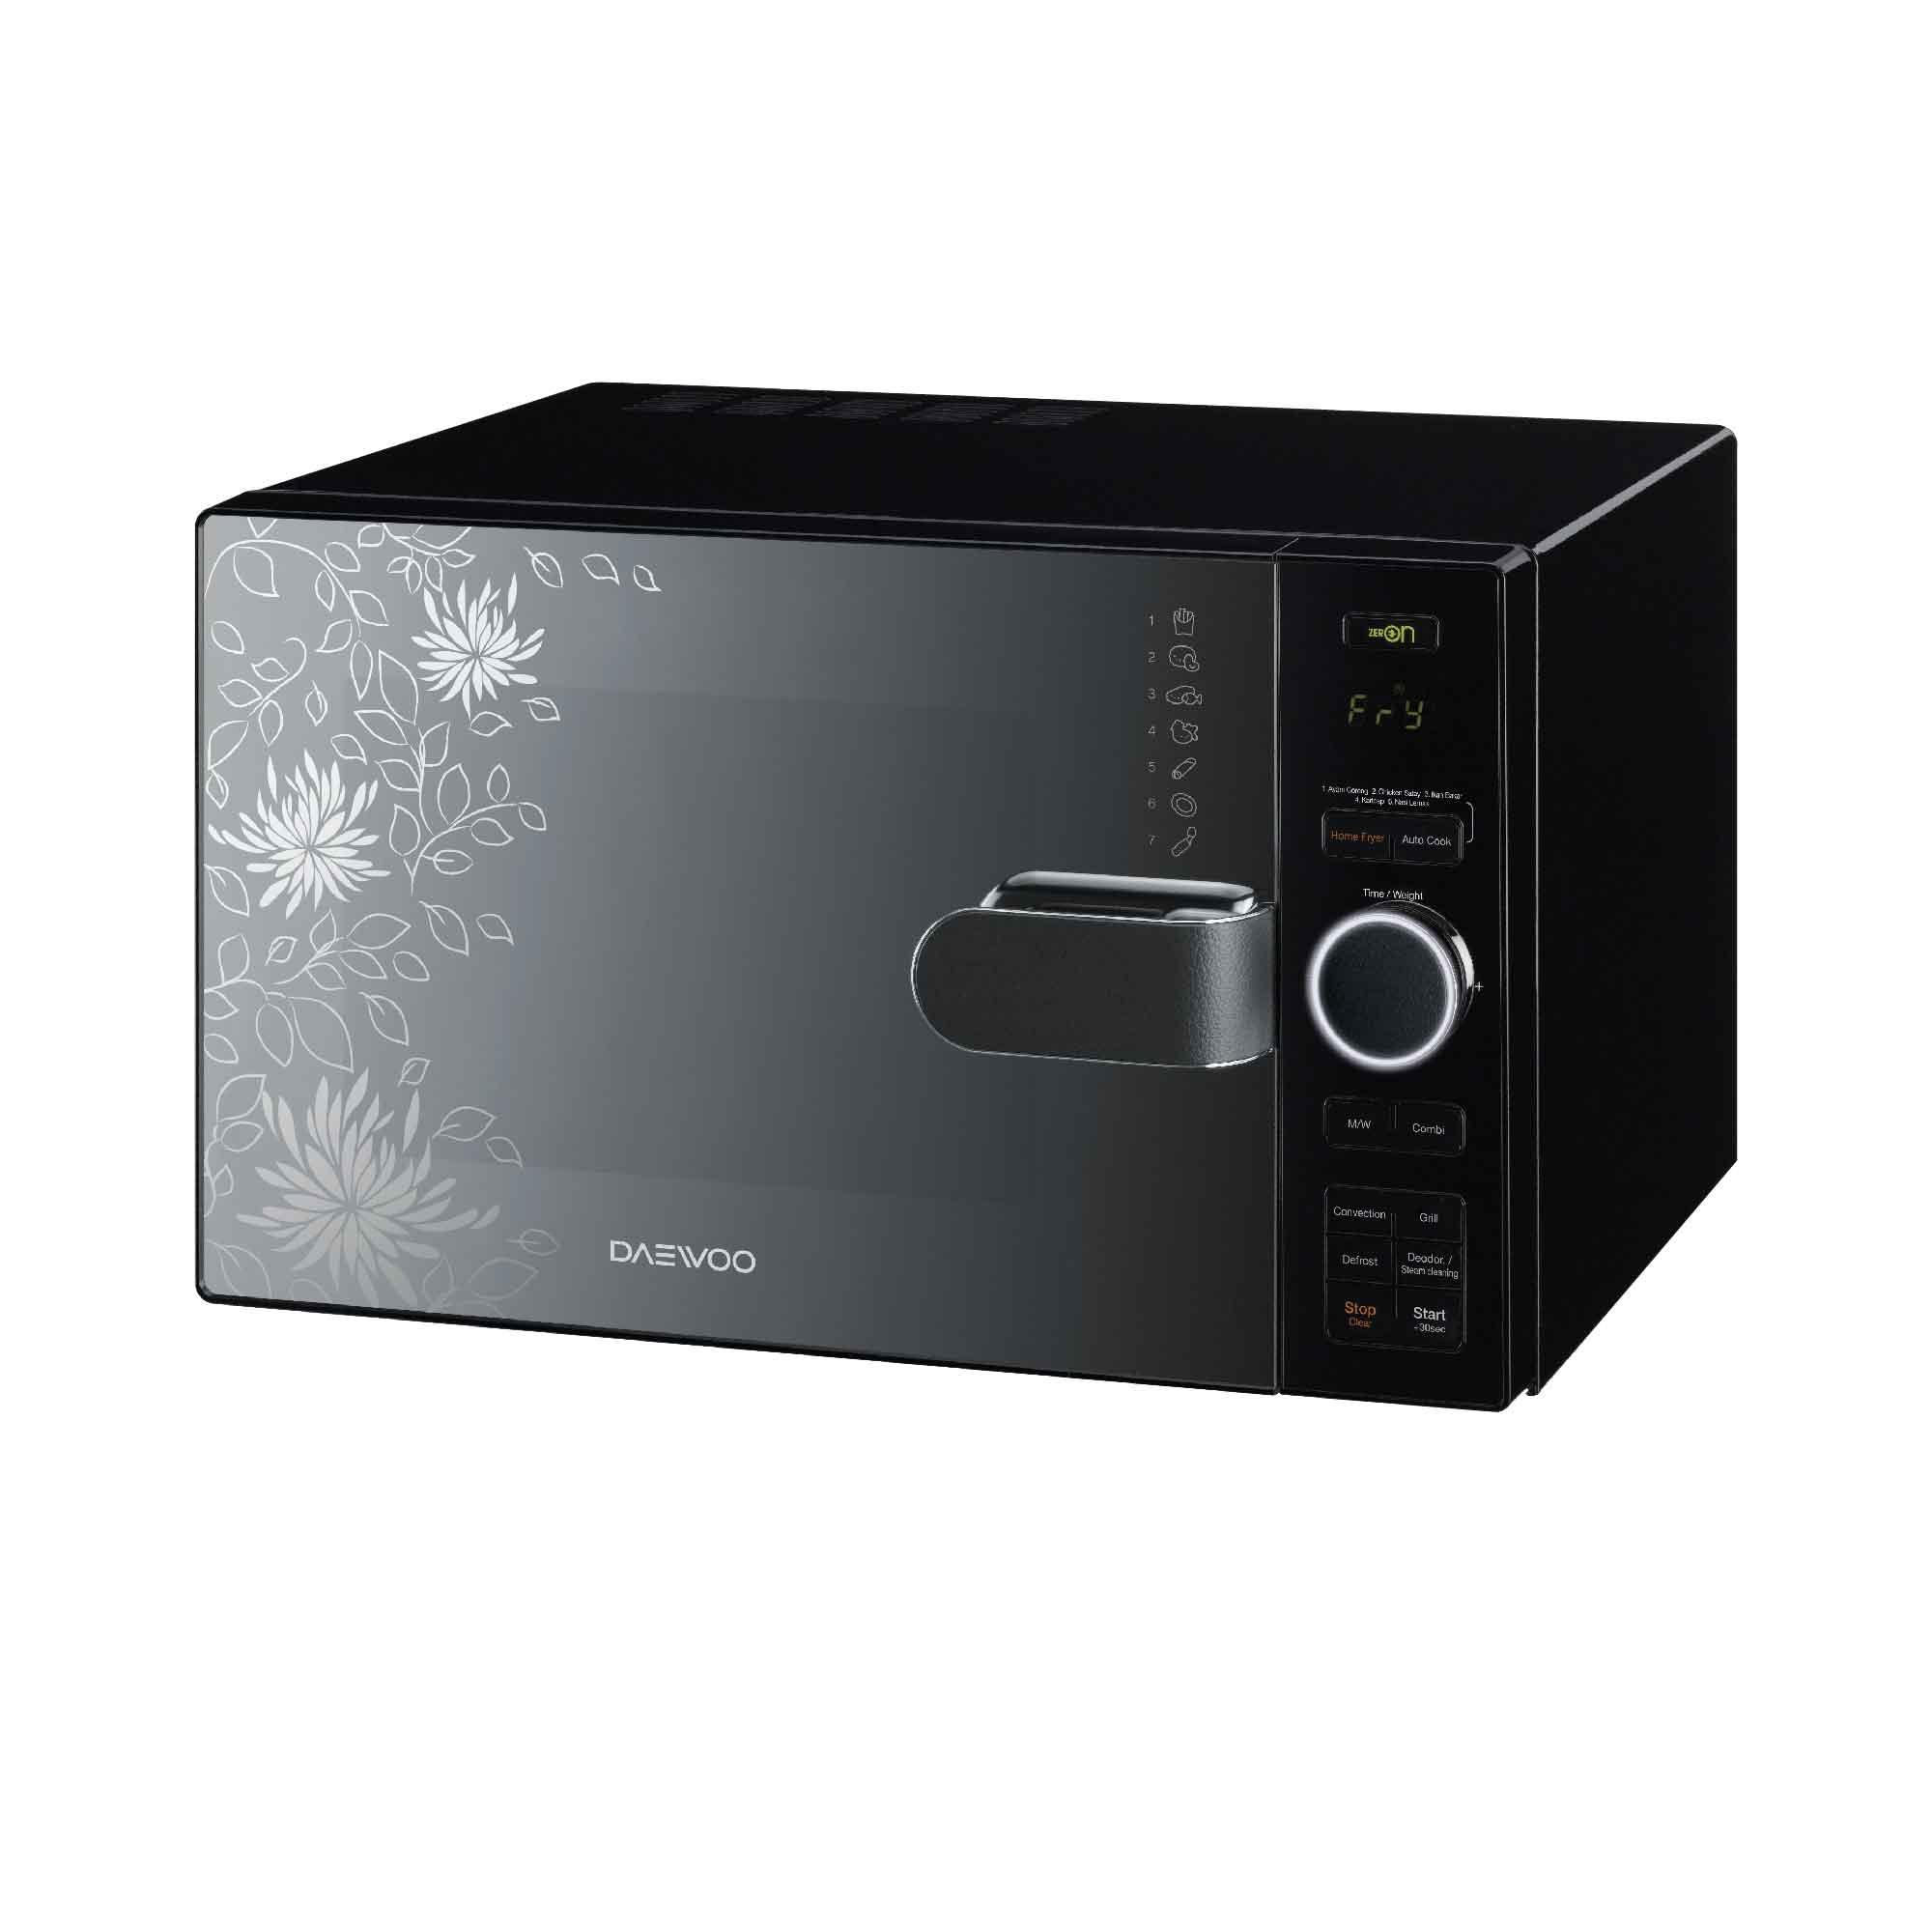 Daewoo Microwave Oven Air Fryer KOC- (end 9/15/2020 5:45 PM)